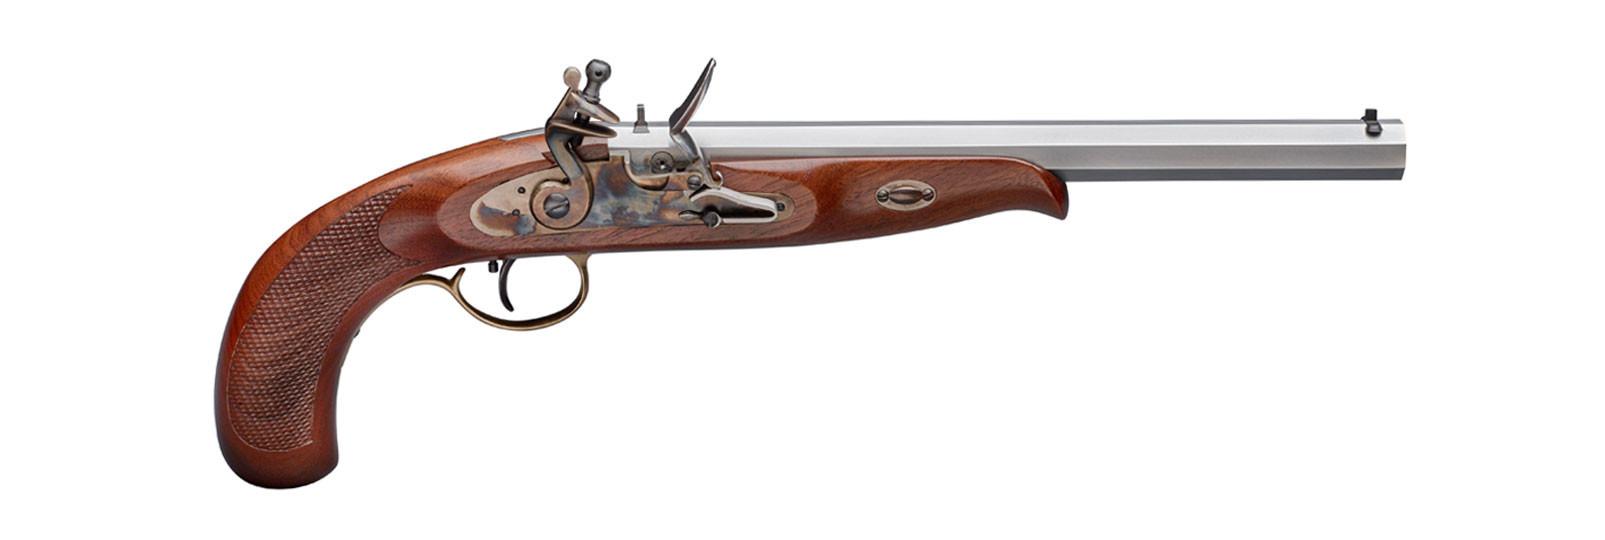 Continental Target Pistol flintlock model